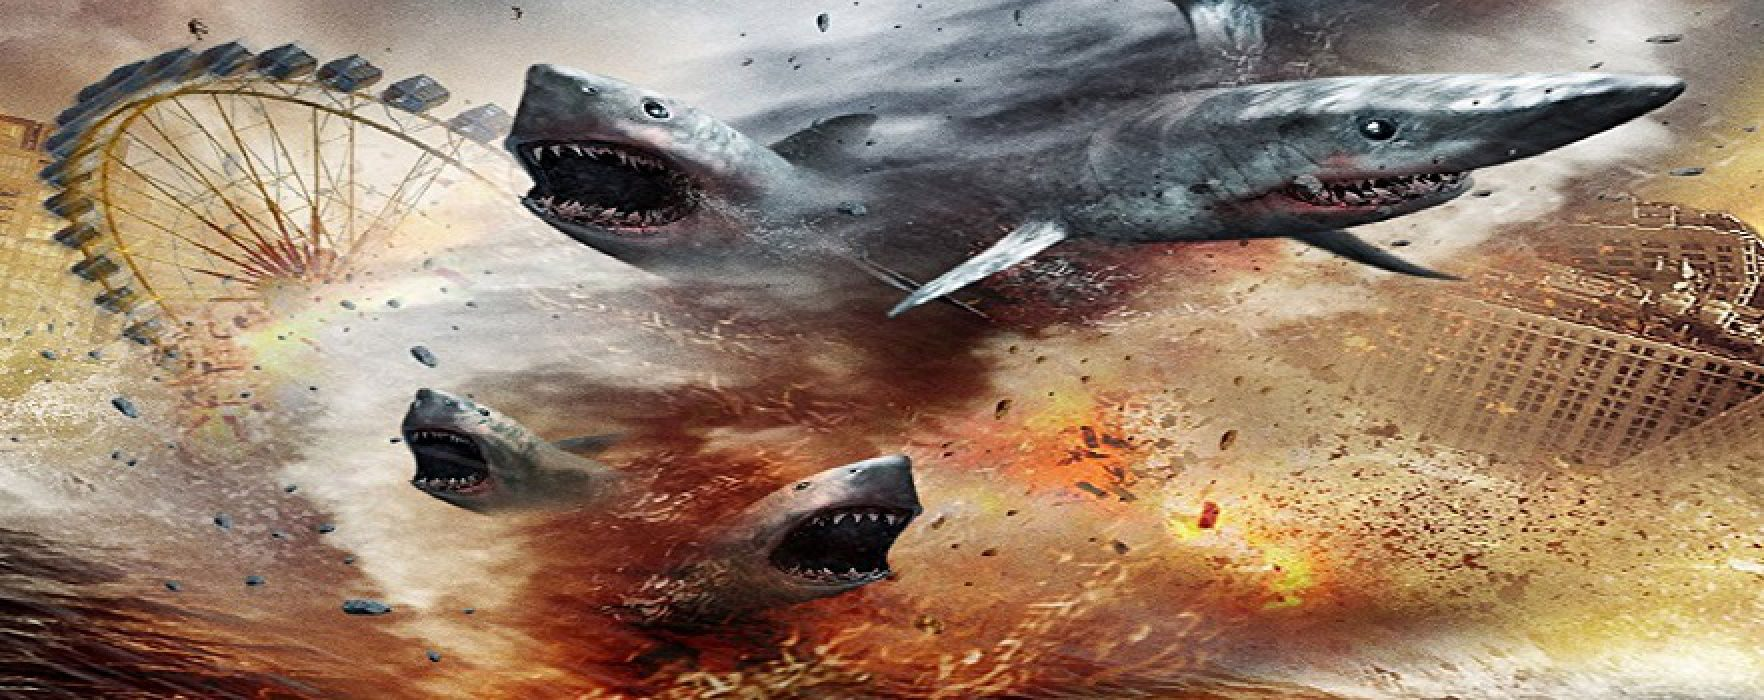 Syfy's Sharknado Franchise Coming to a Close